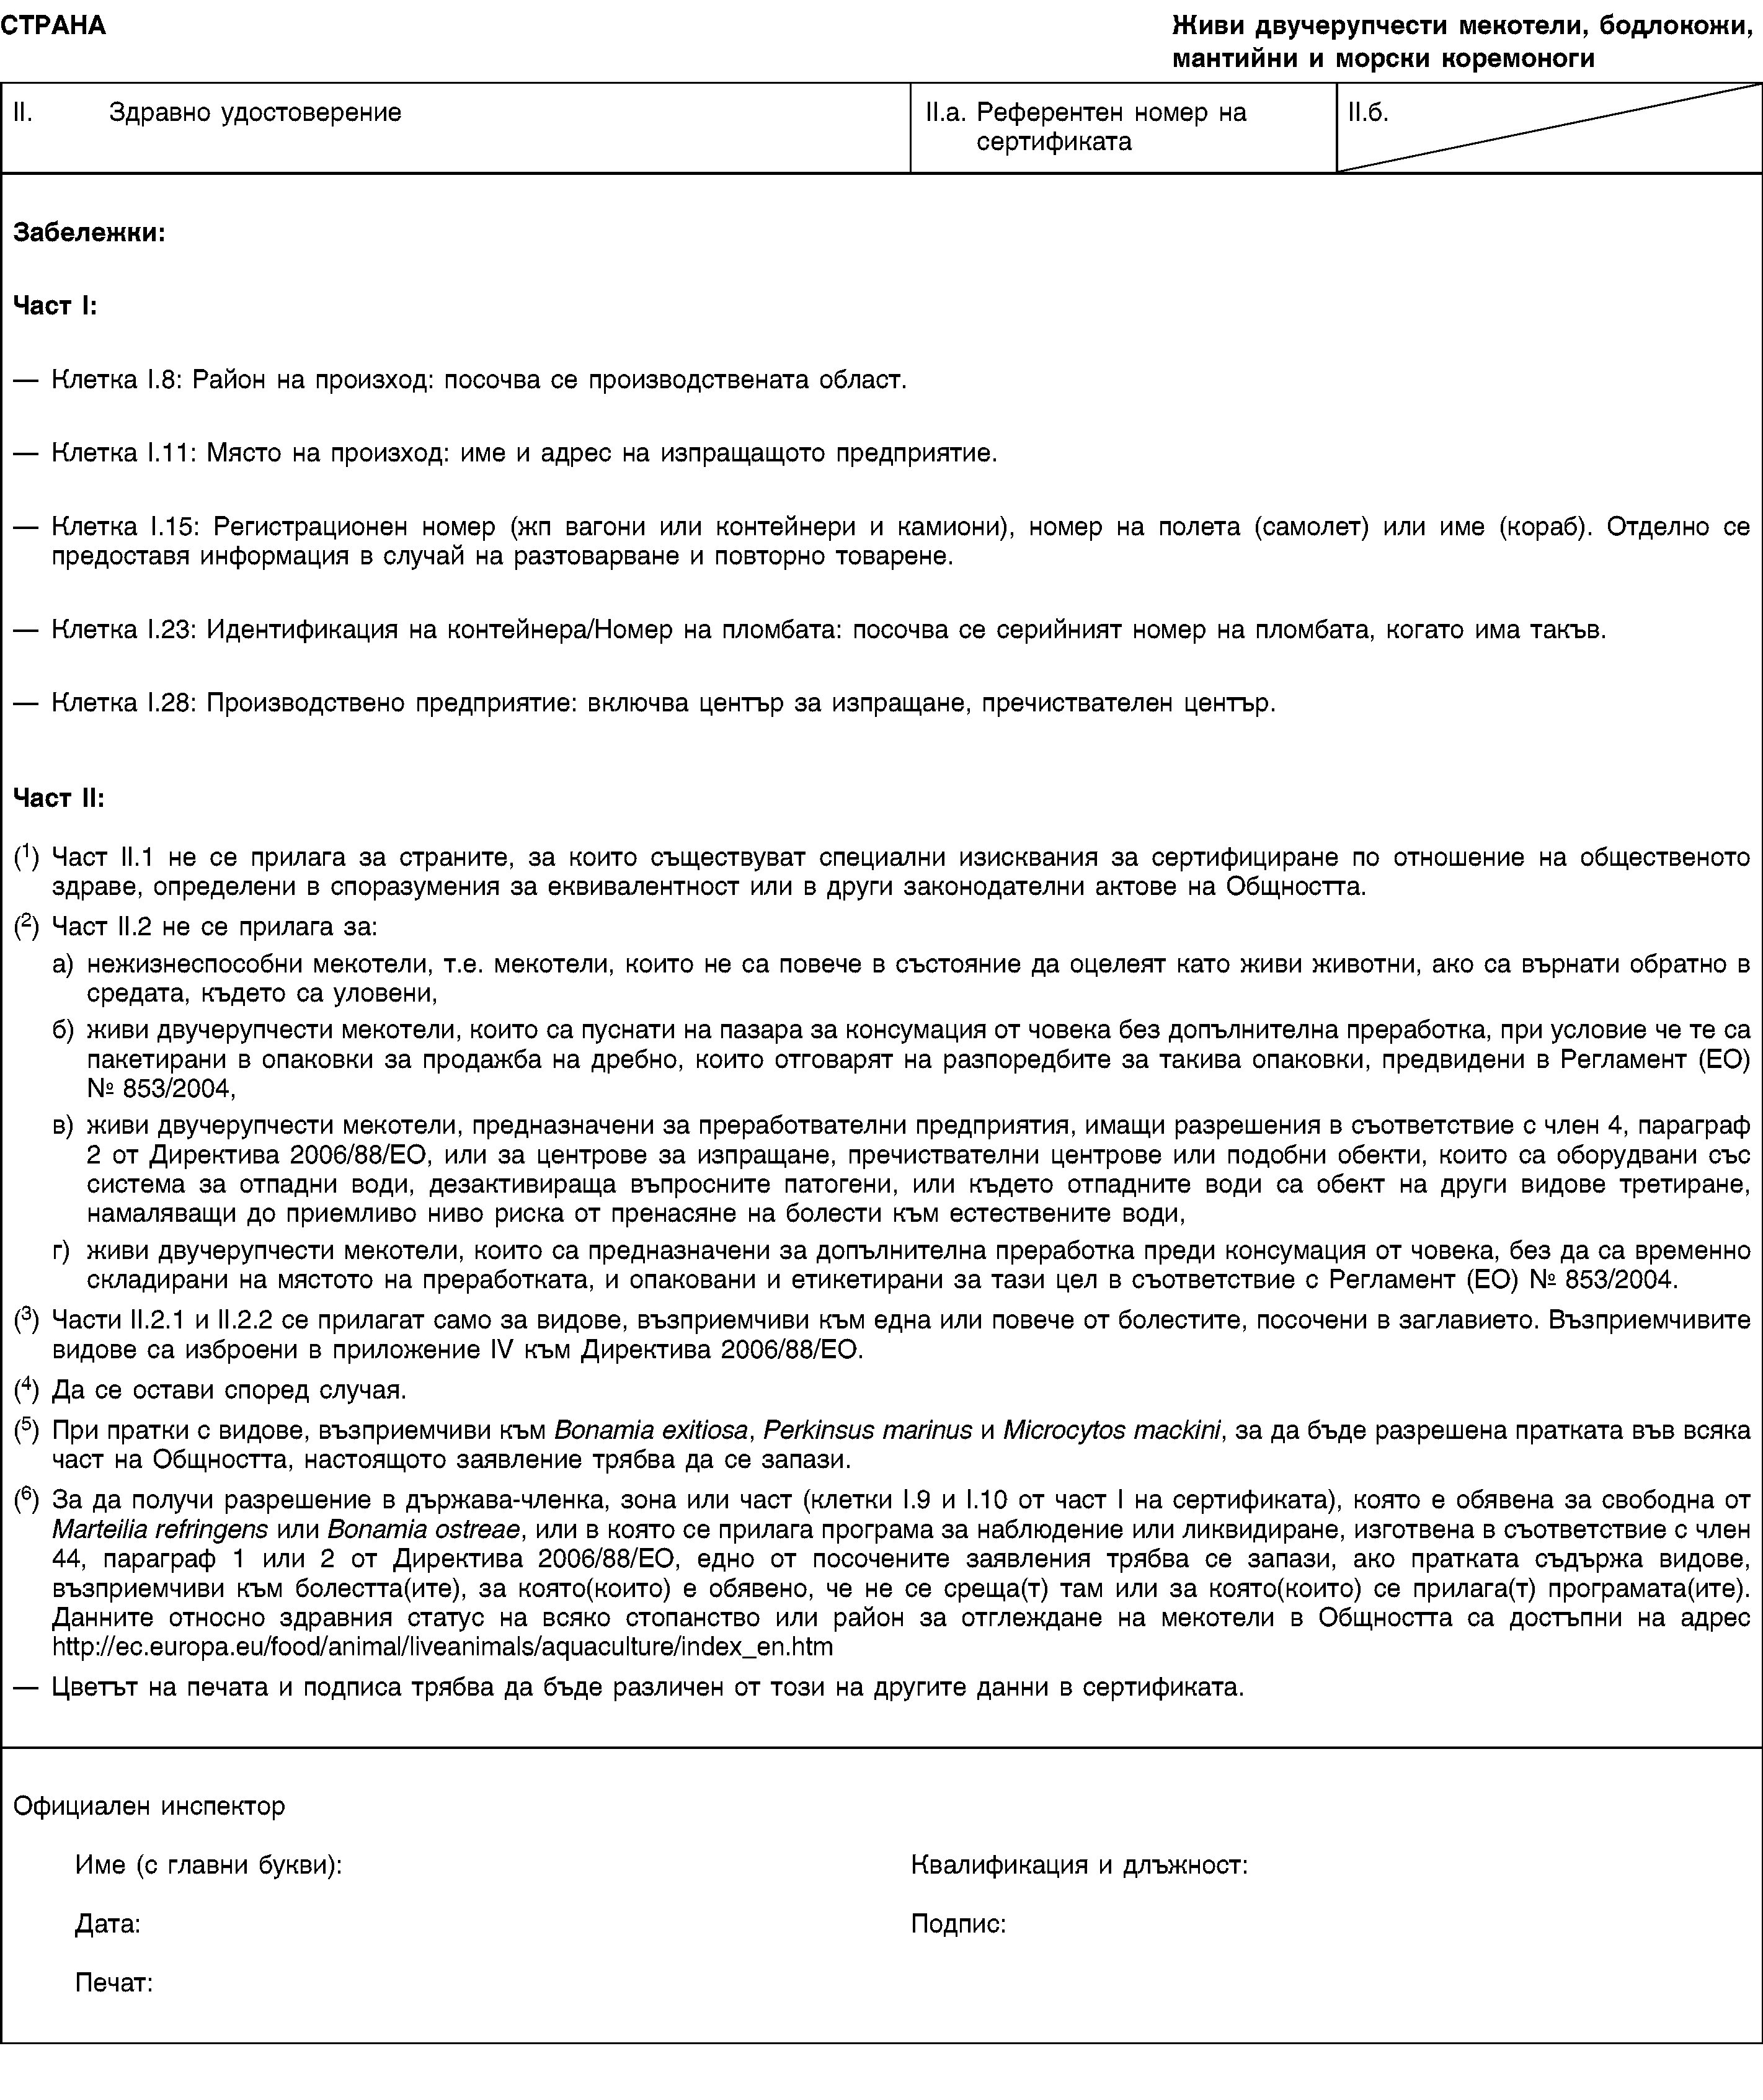 EUR-Lex - 02005R2074-20160603 - EN - EUR-Lex